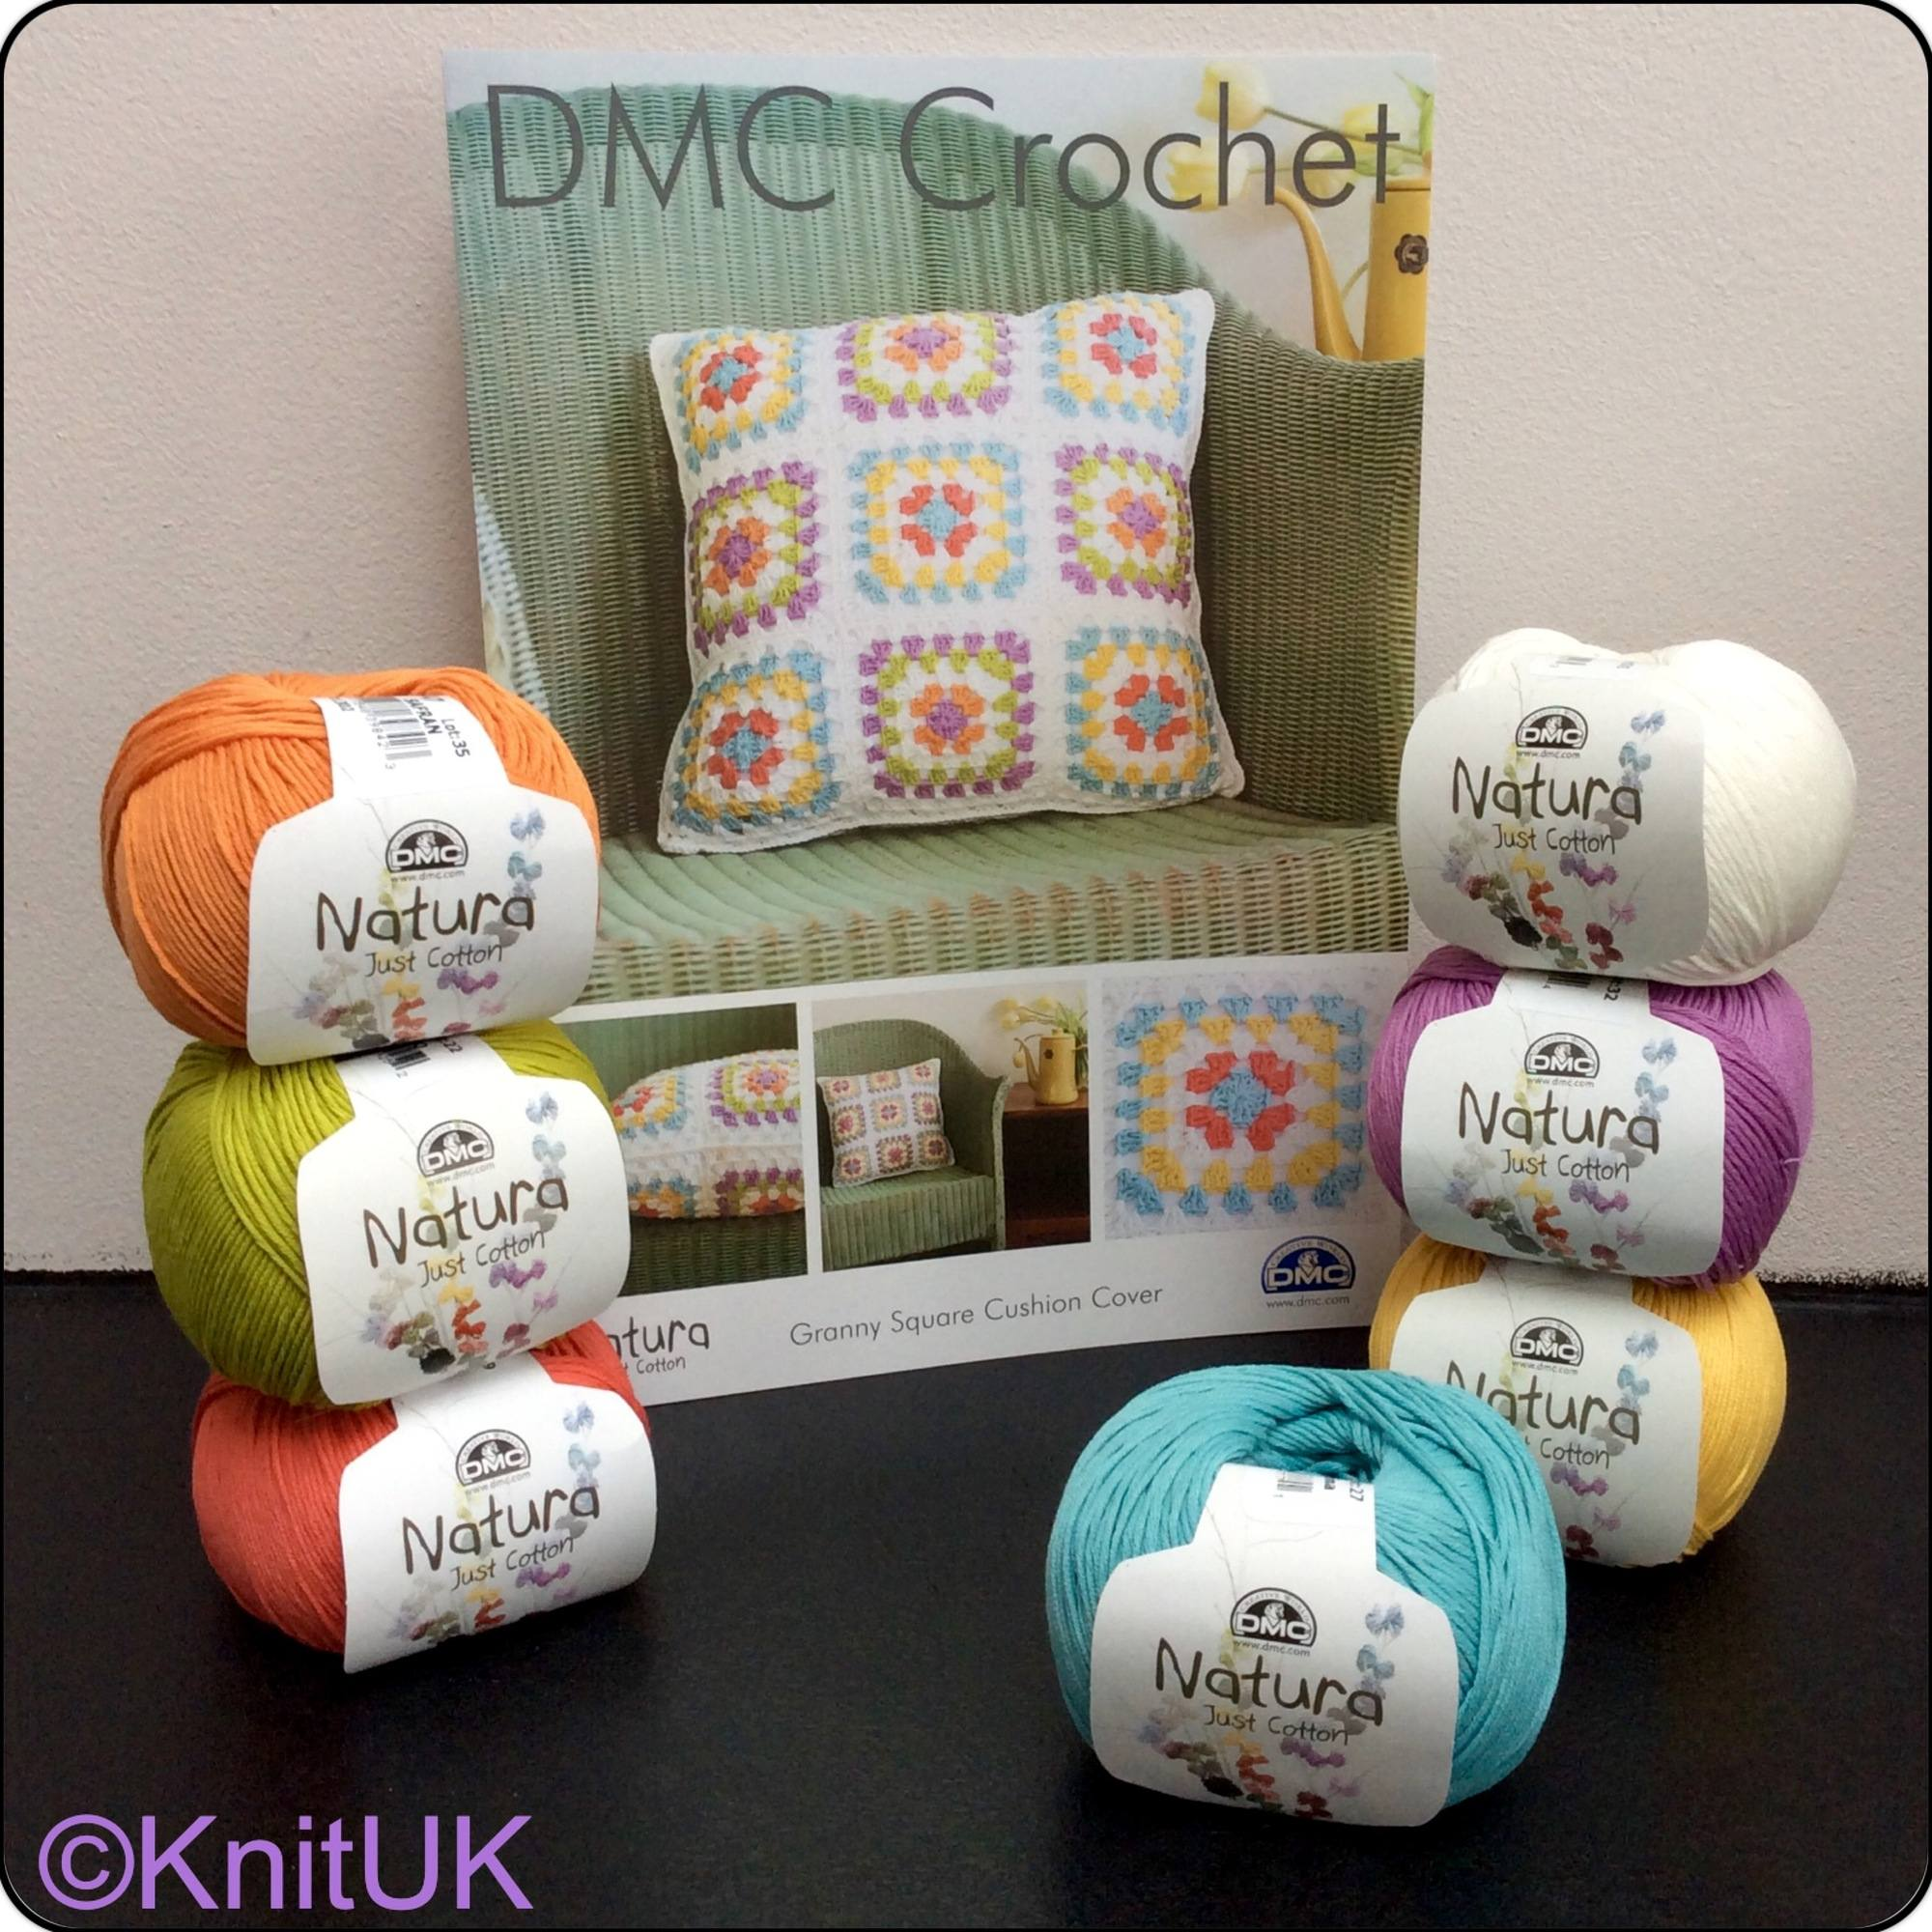 dmc crochet natura 4ply and Granny Square cushion cover